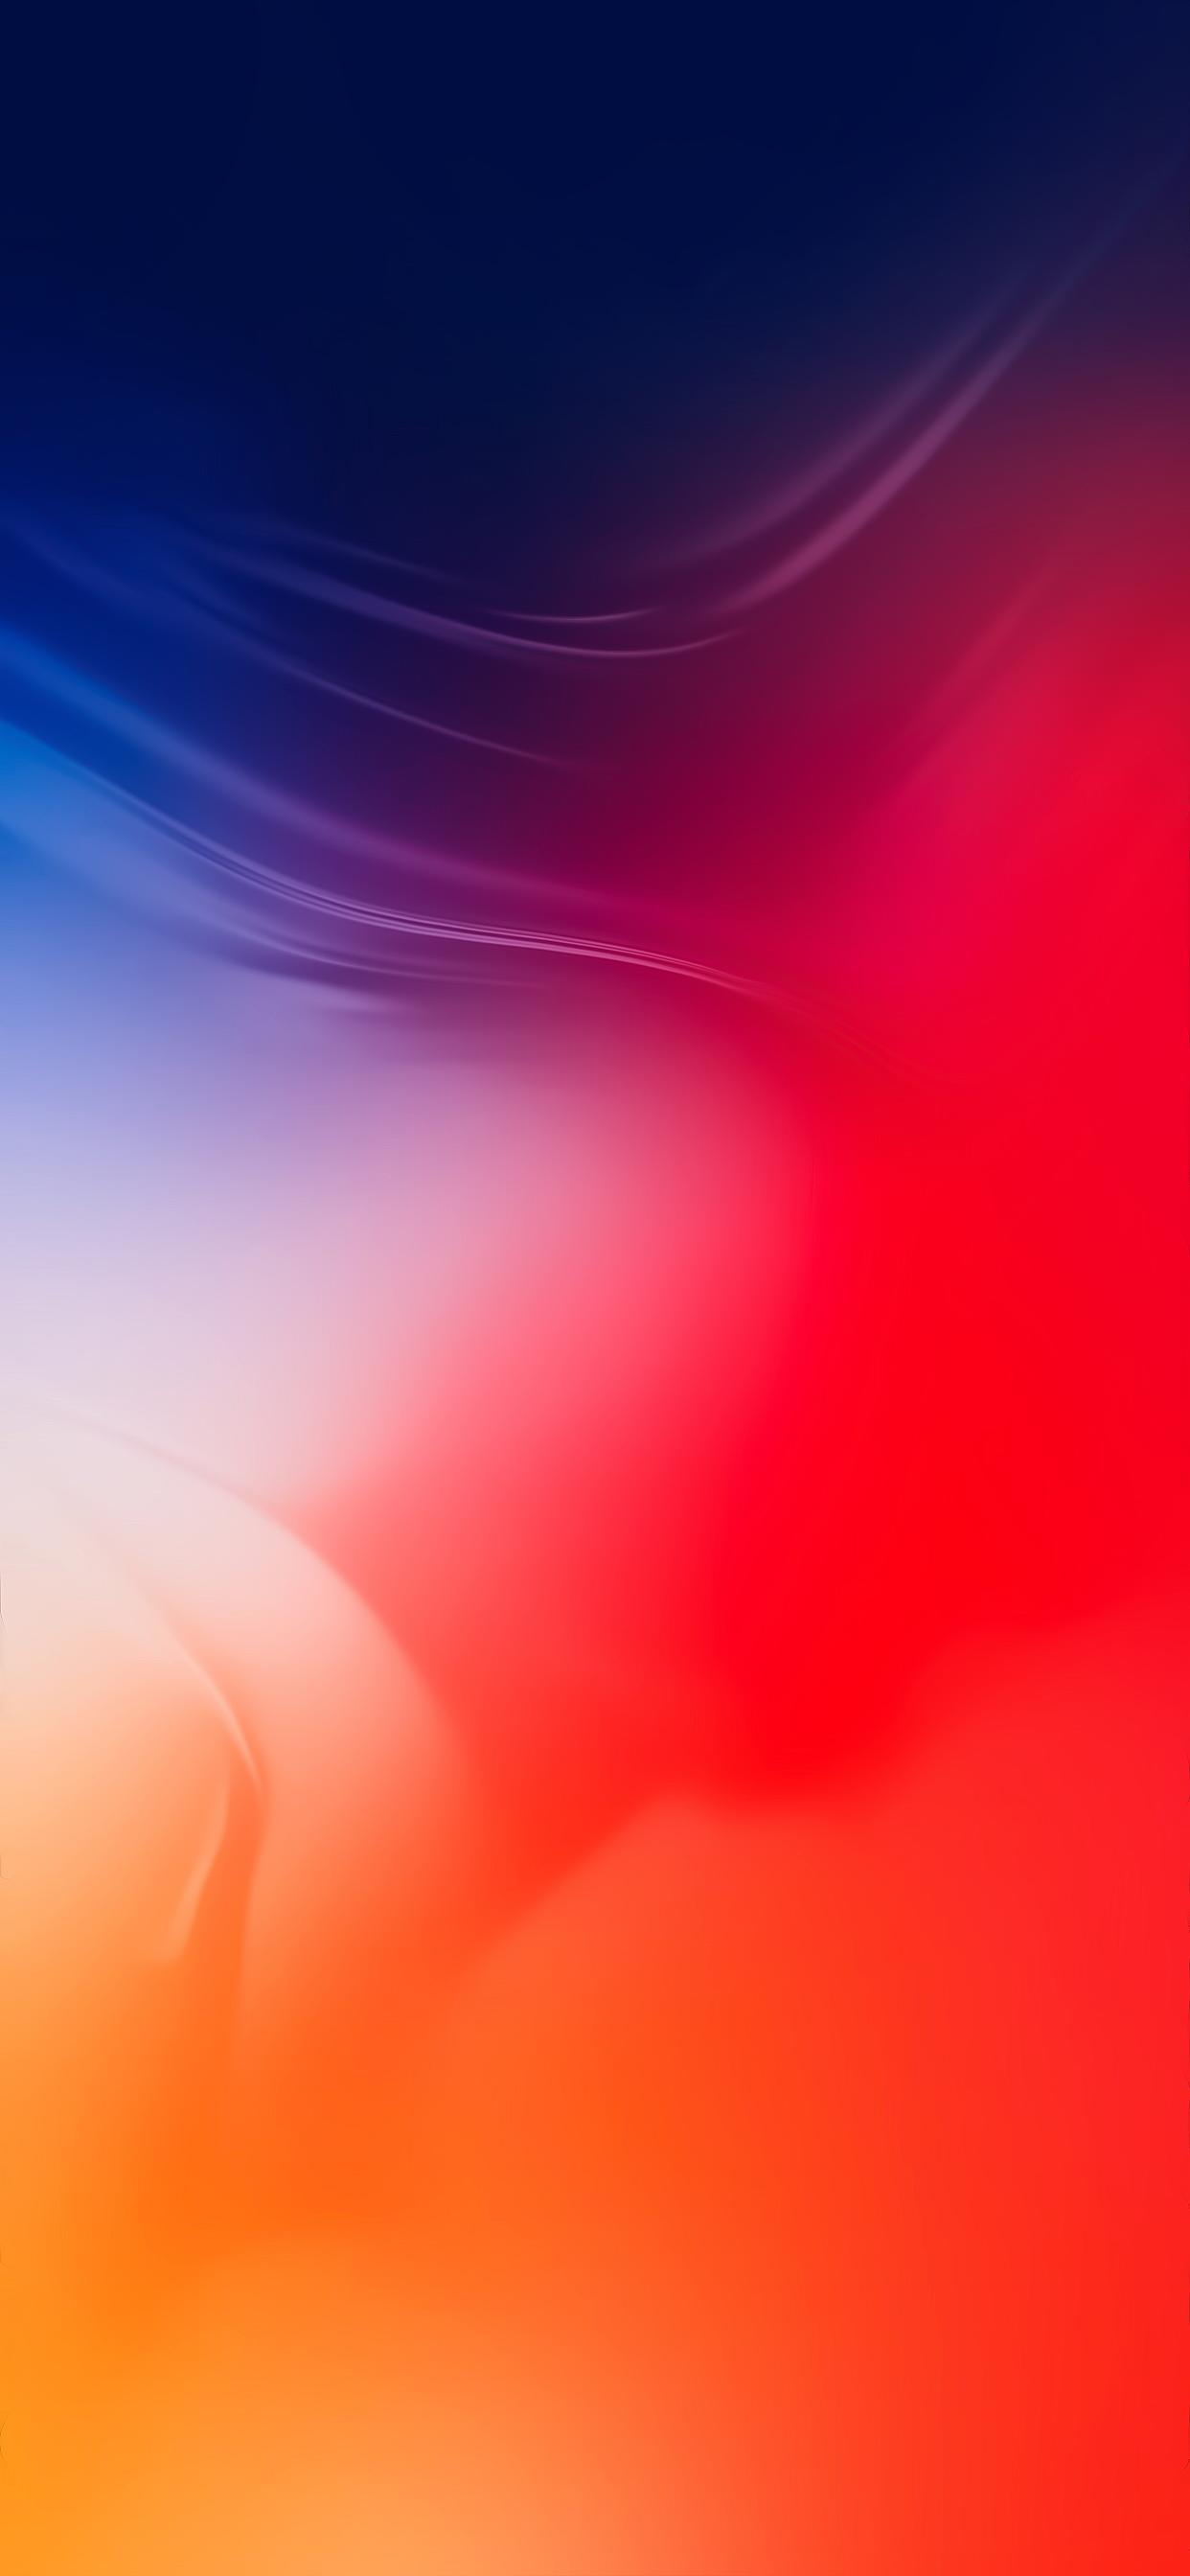 iOS 13 concept by AR72014 Zollotech 1242x2688